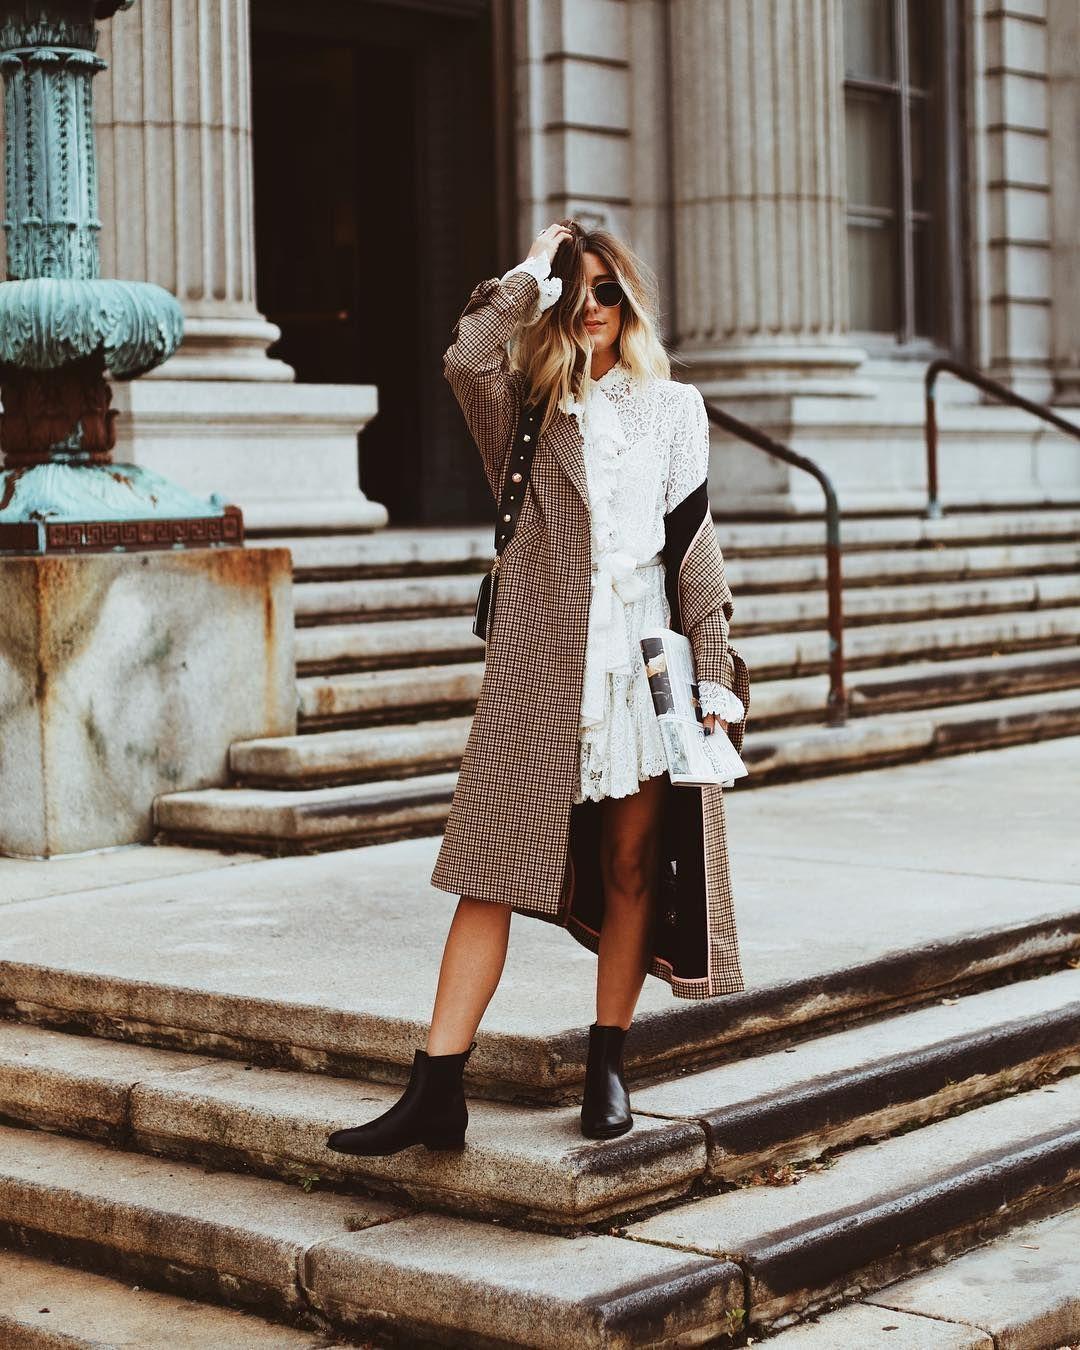 49406f0b80a Melissa Chelsea Boots | FRYE Since 1863 | stylin | Fashion, Style ...